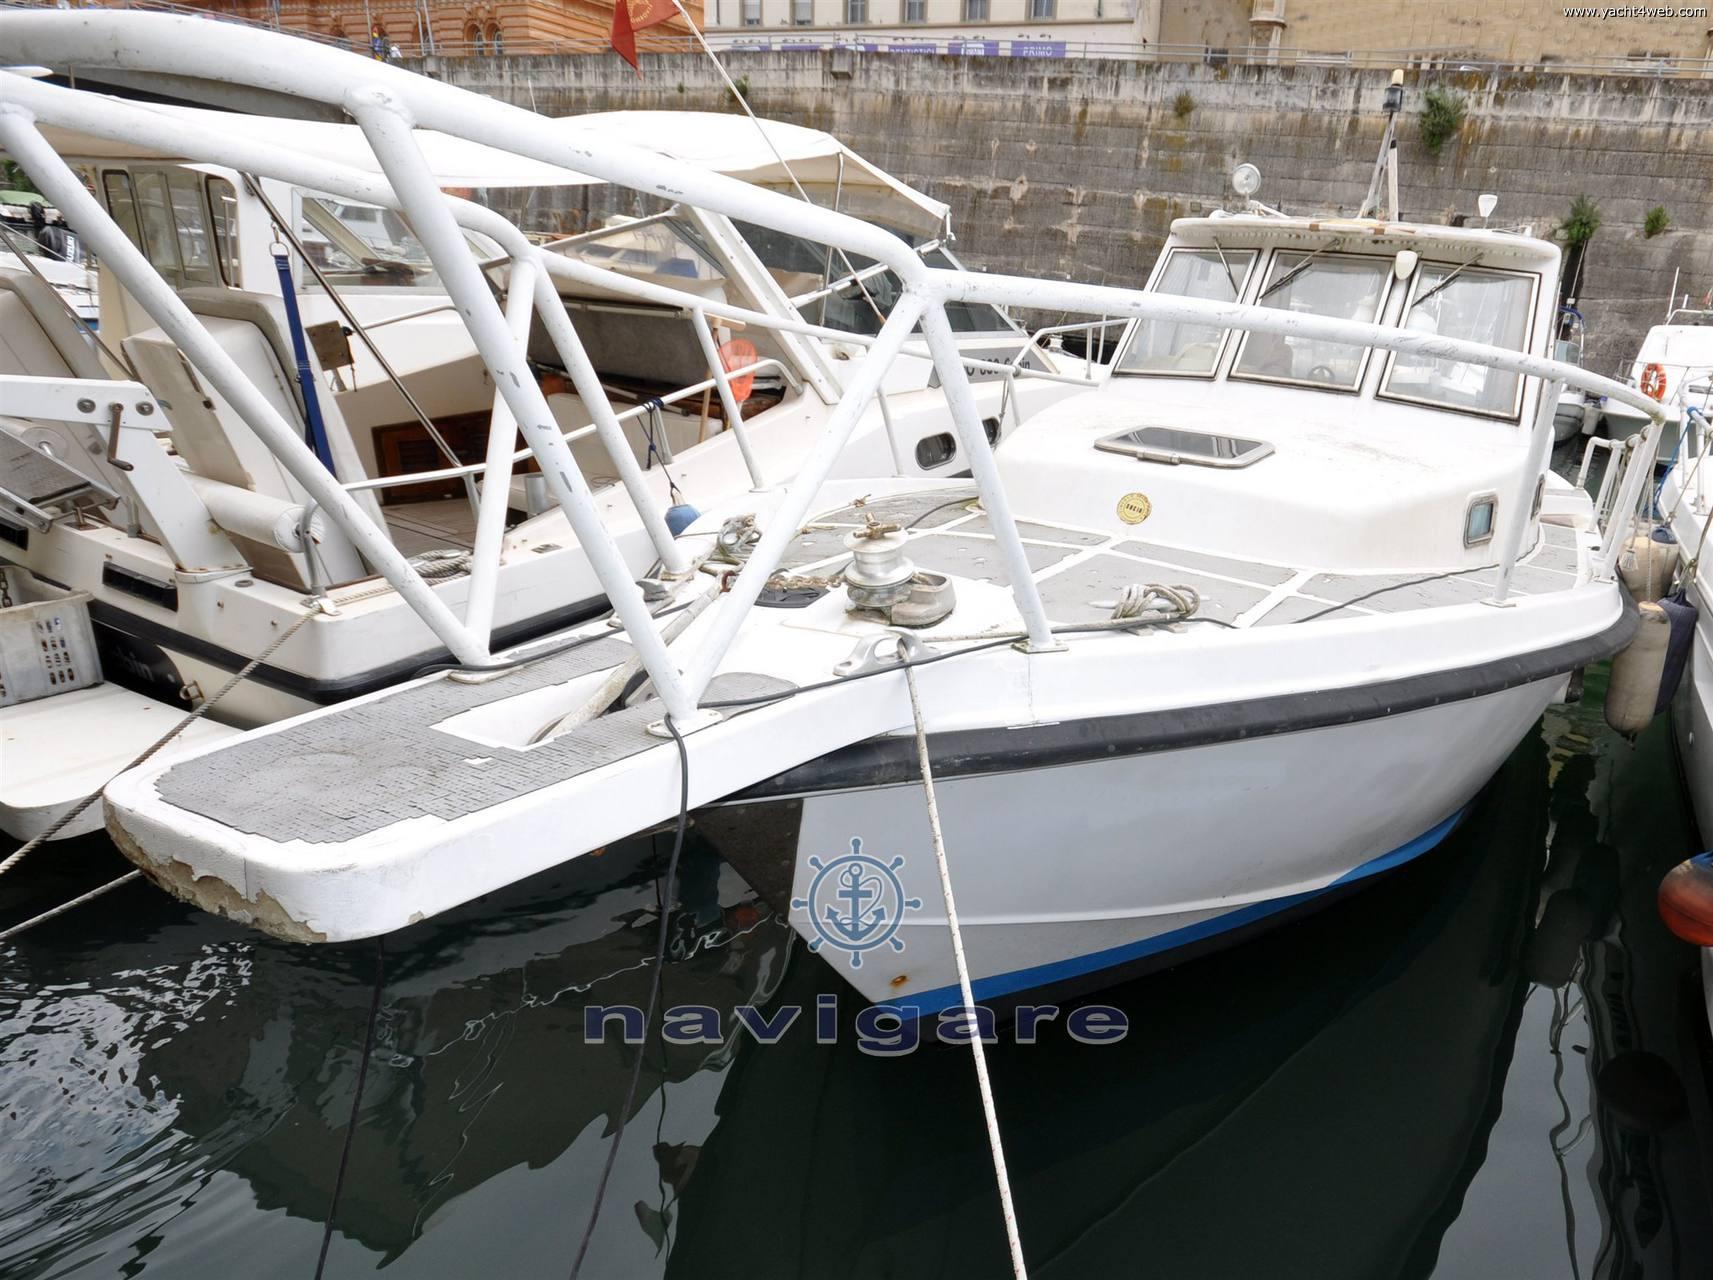 Catarsi Calafuria 98 Bateau à moteur nouveau en vente